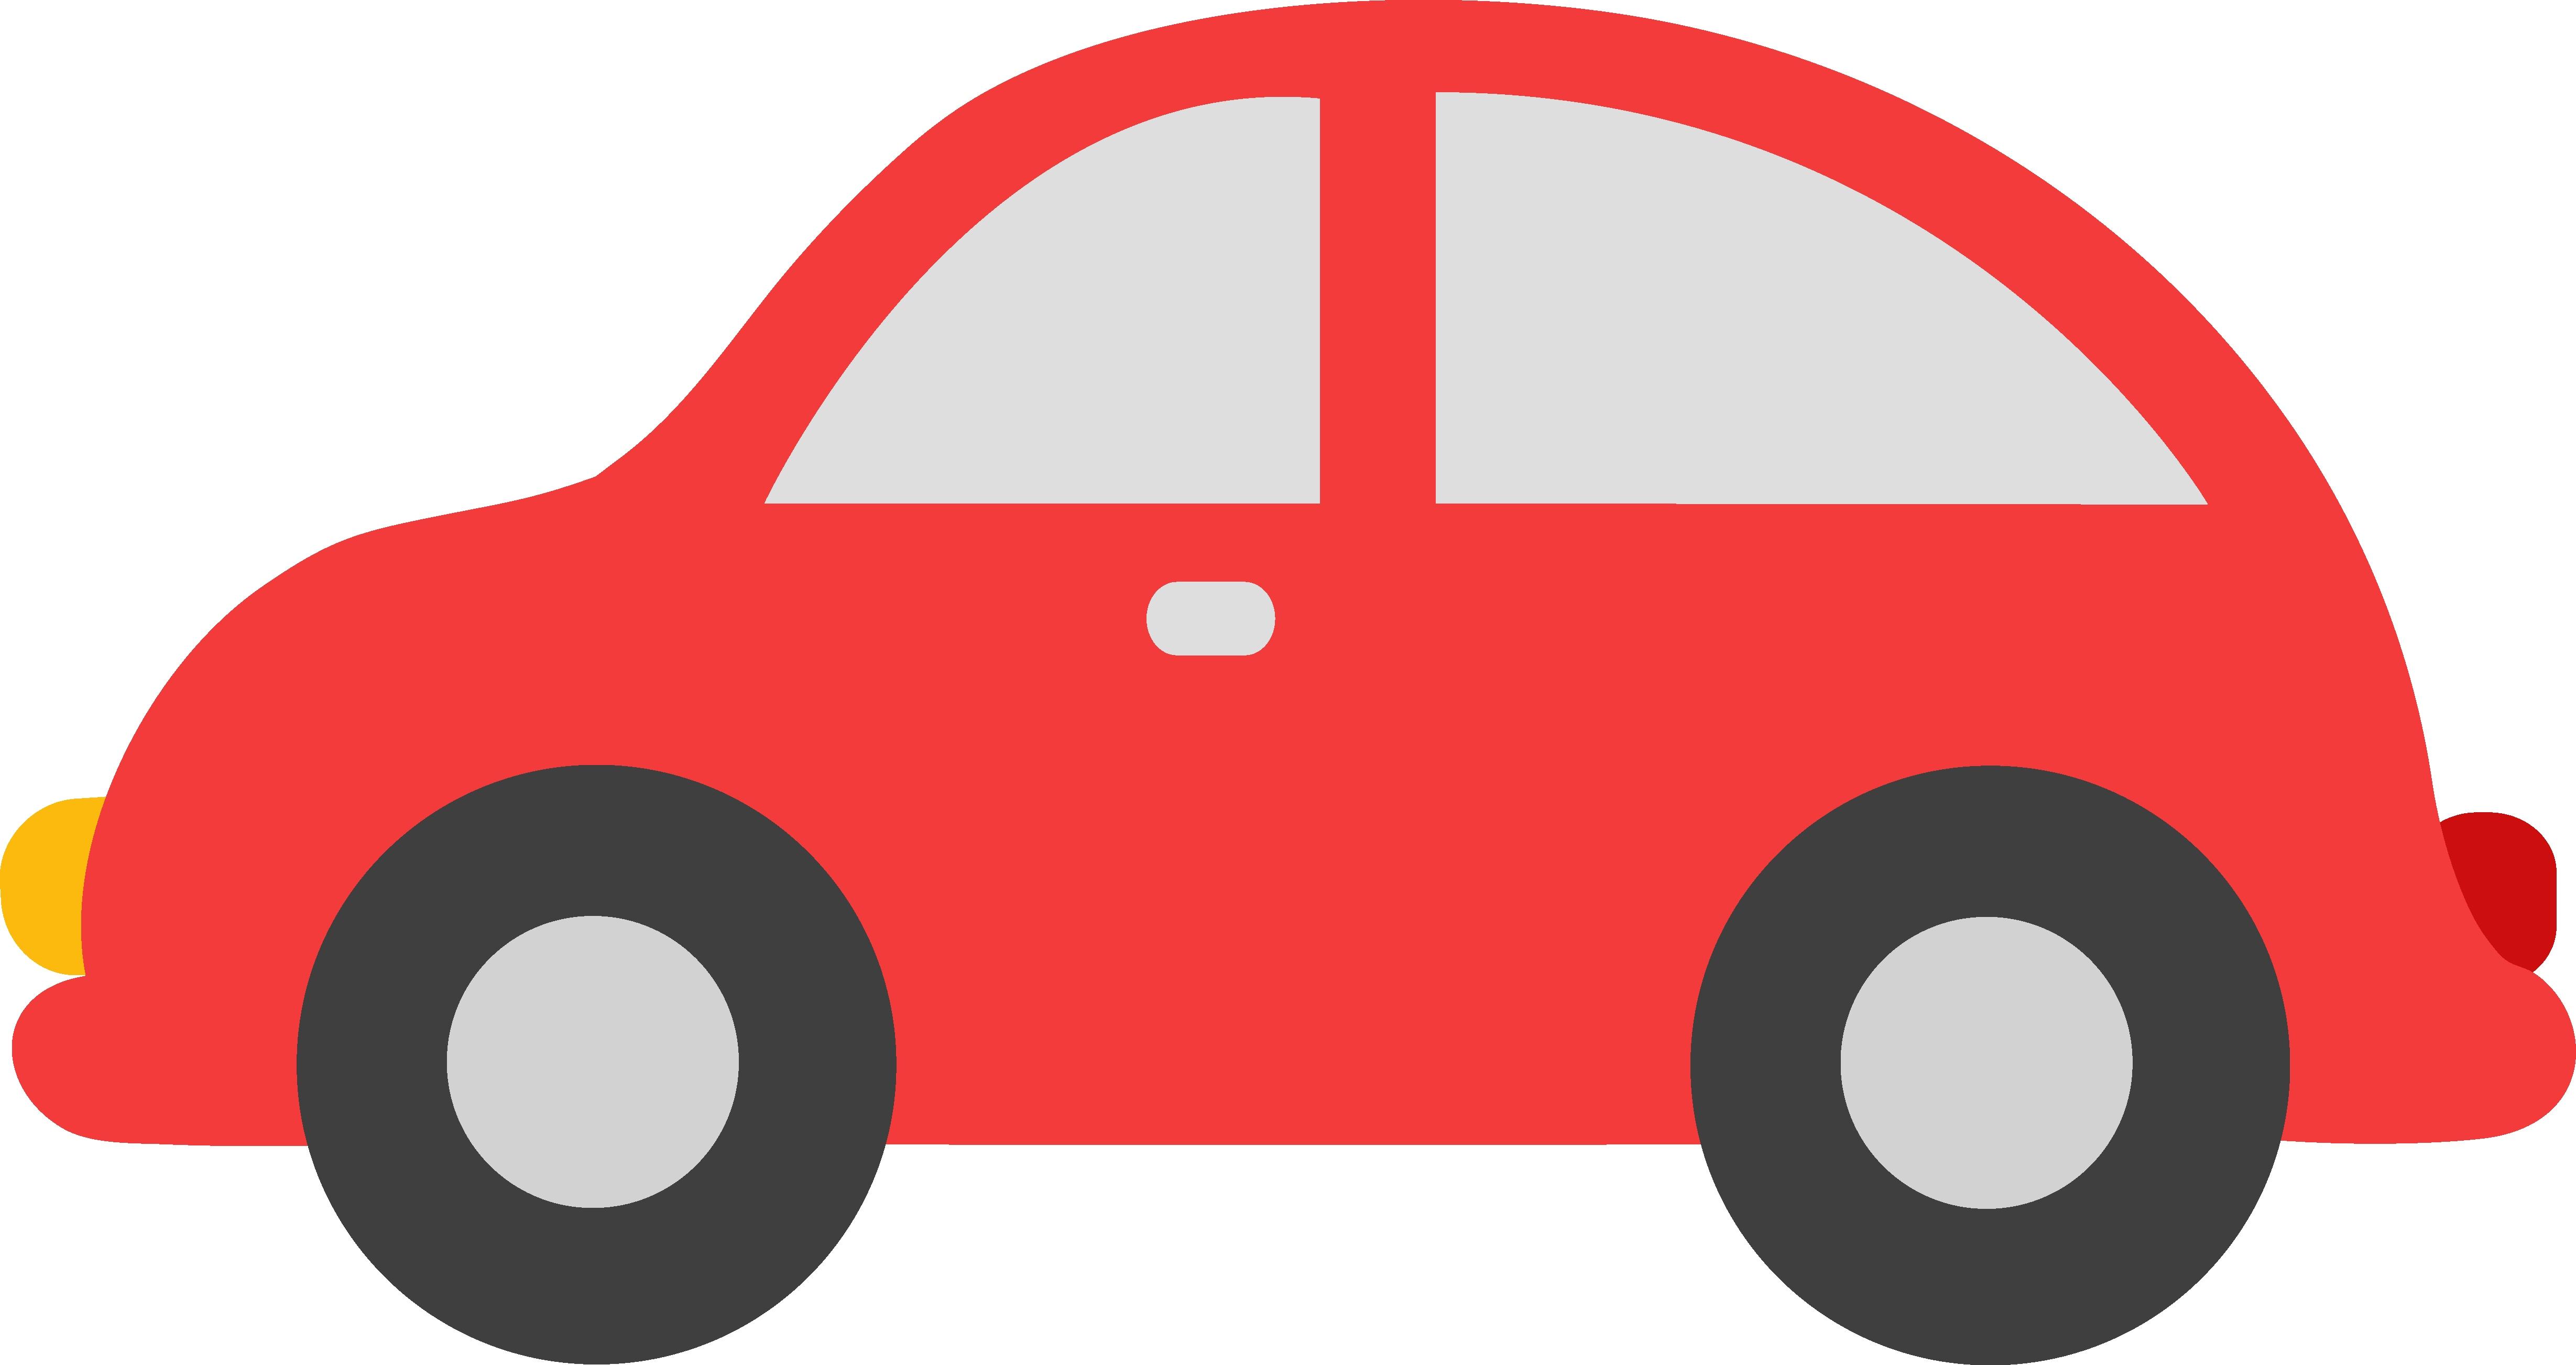 4916x2605 Simple Car Imagesspirational Car Clipart Simple Pencil And